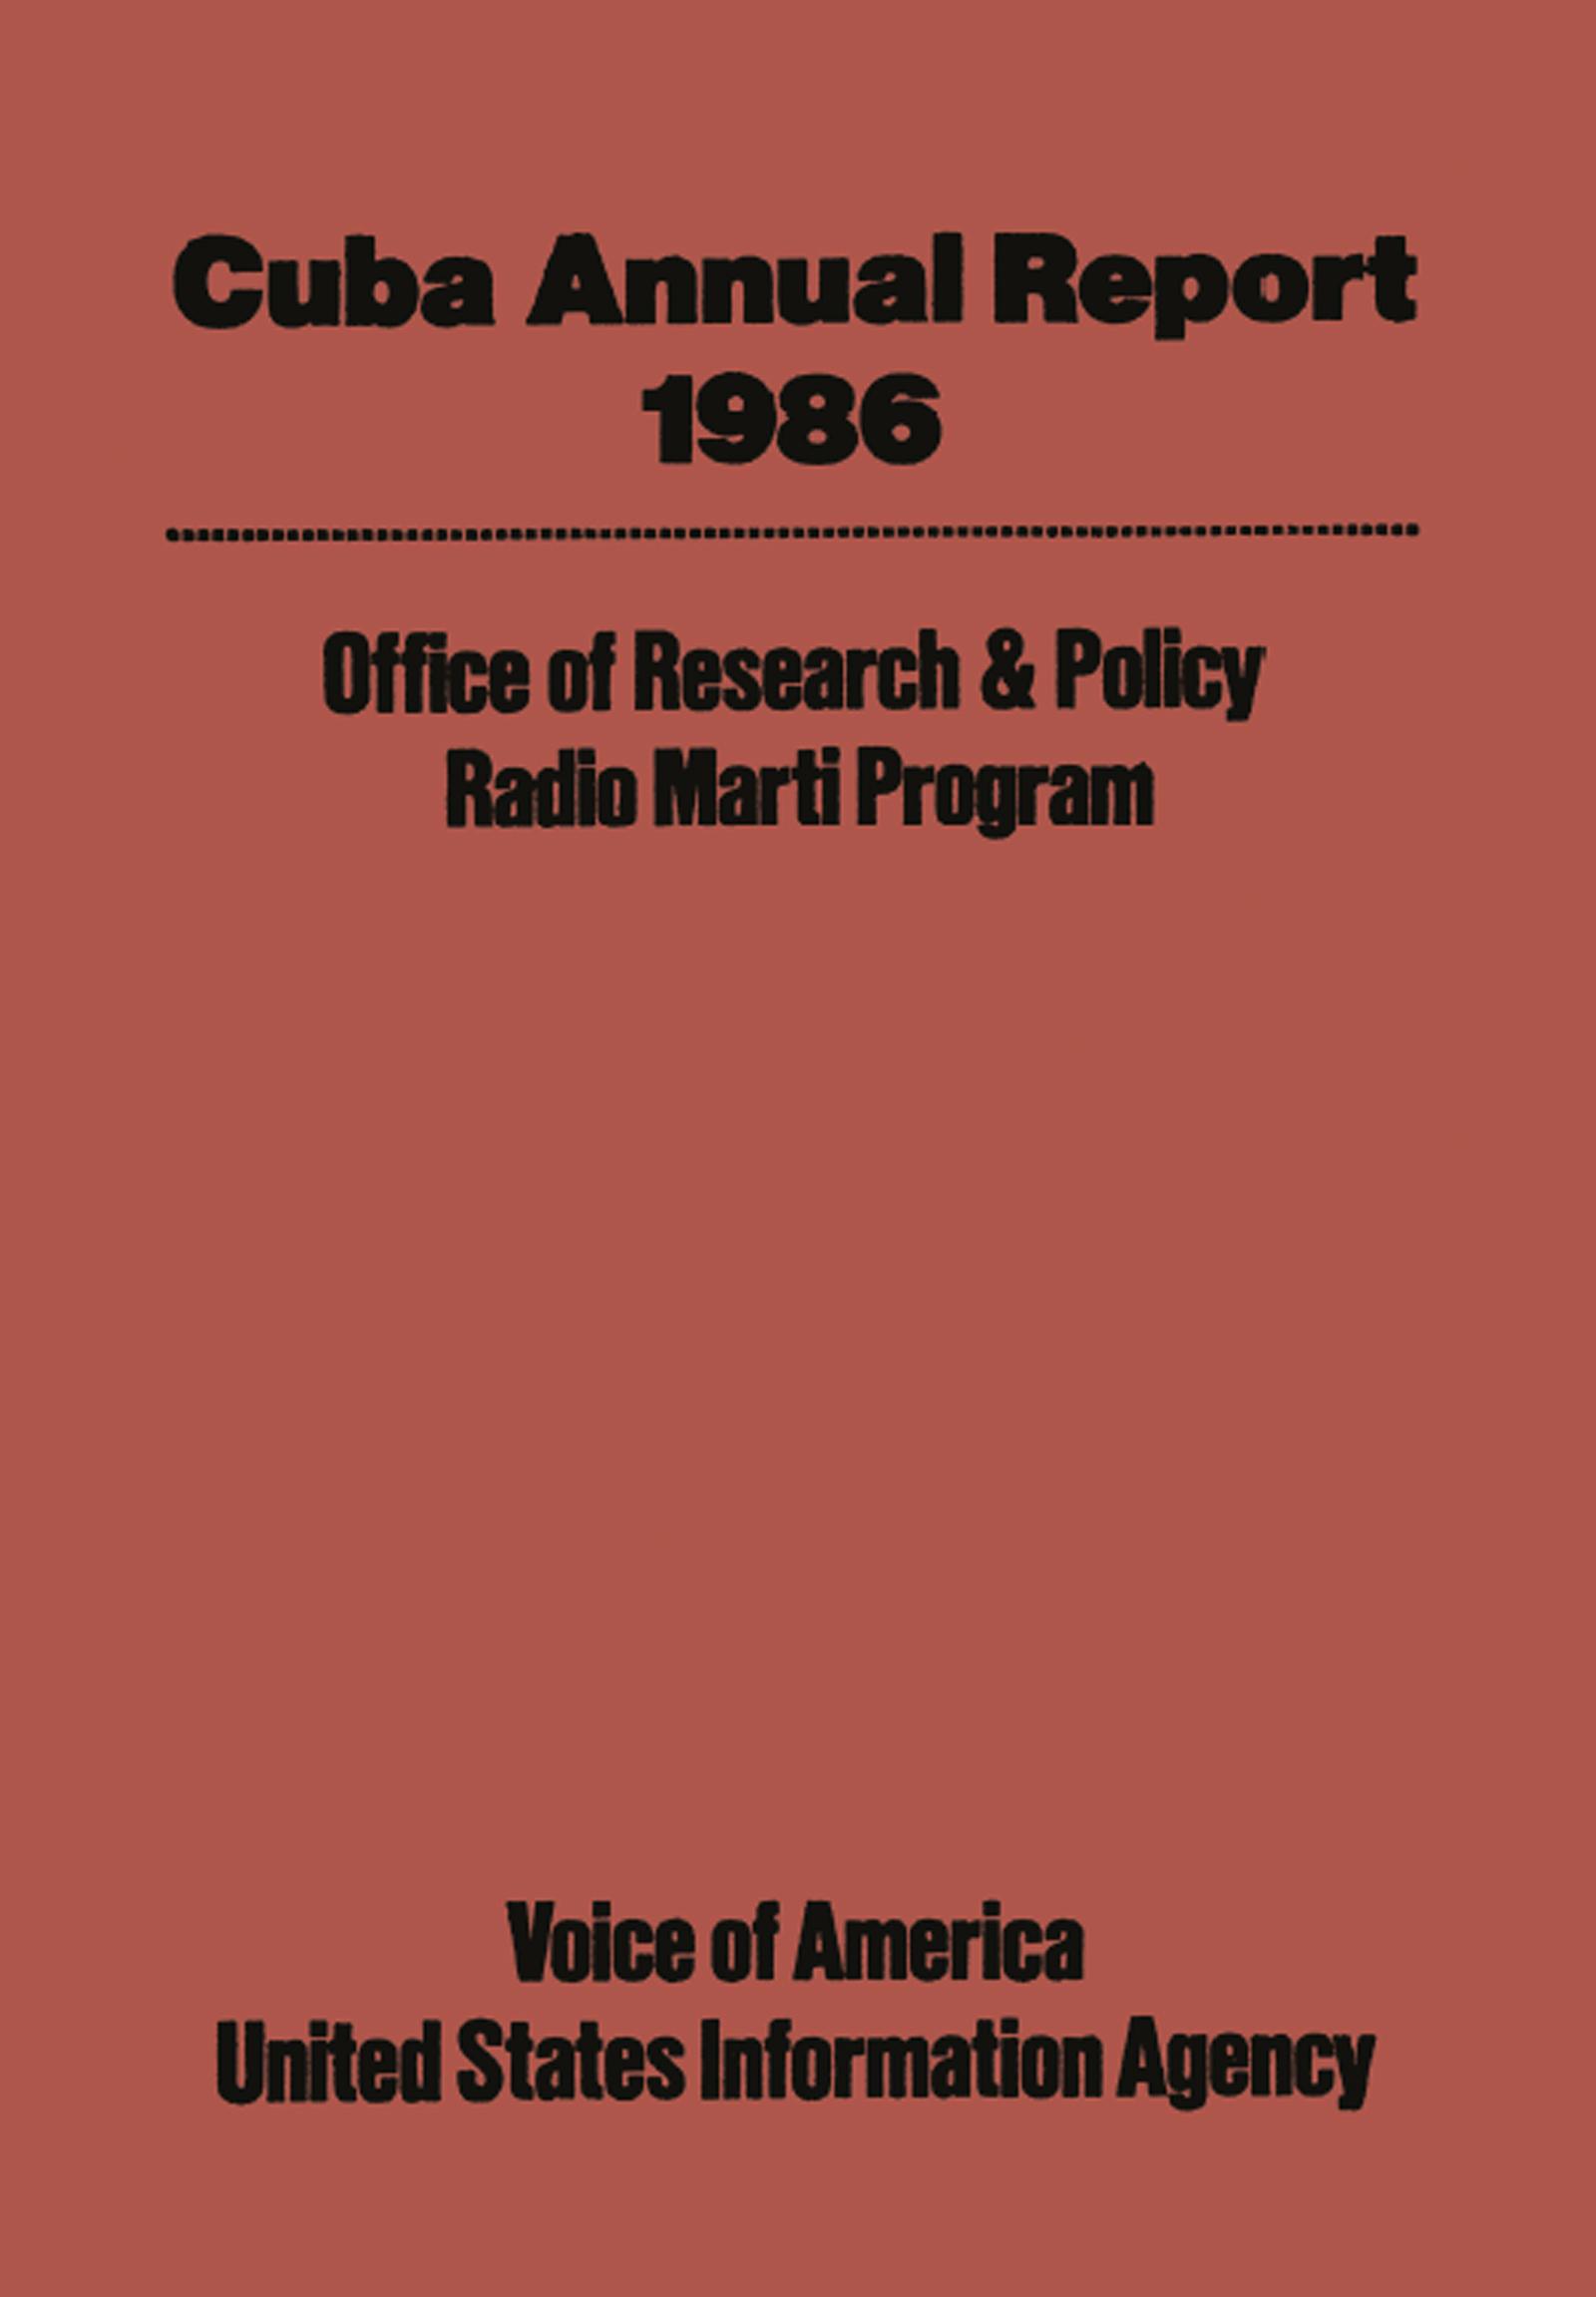 Cuba Annual Report: 1986 book cover